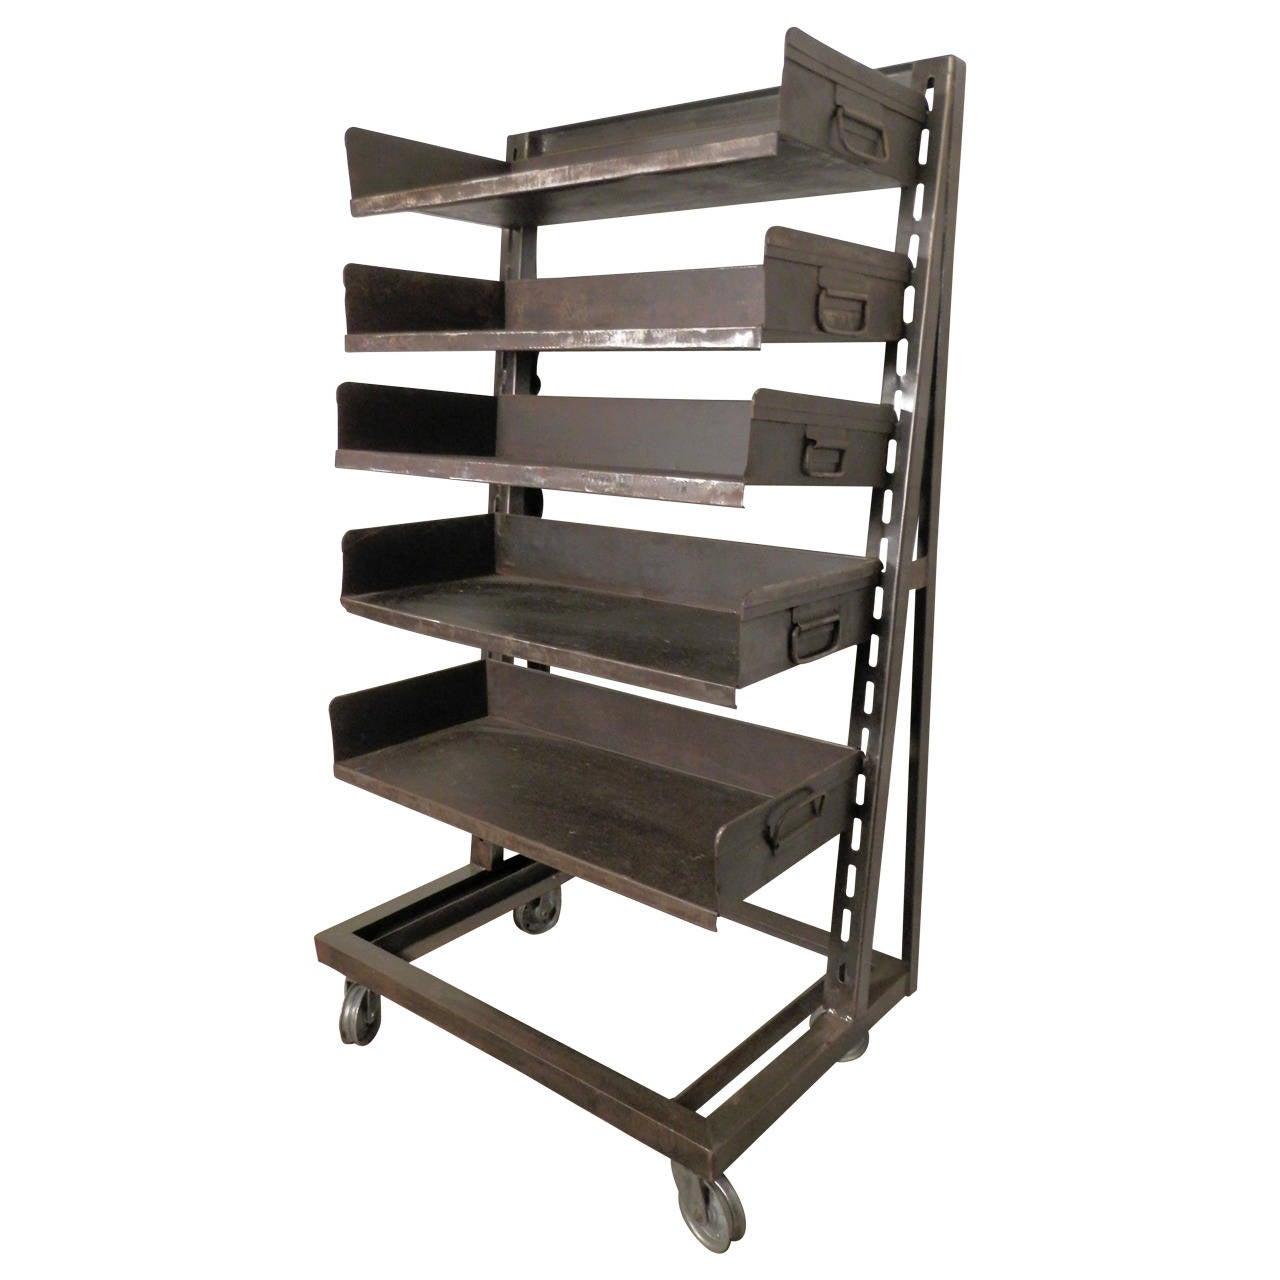 large industrial metal shelving unit at 1stdibs heavy duty adjustable shelving heavy duty adjustable shelving